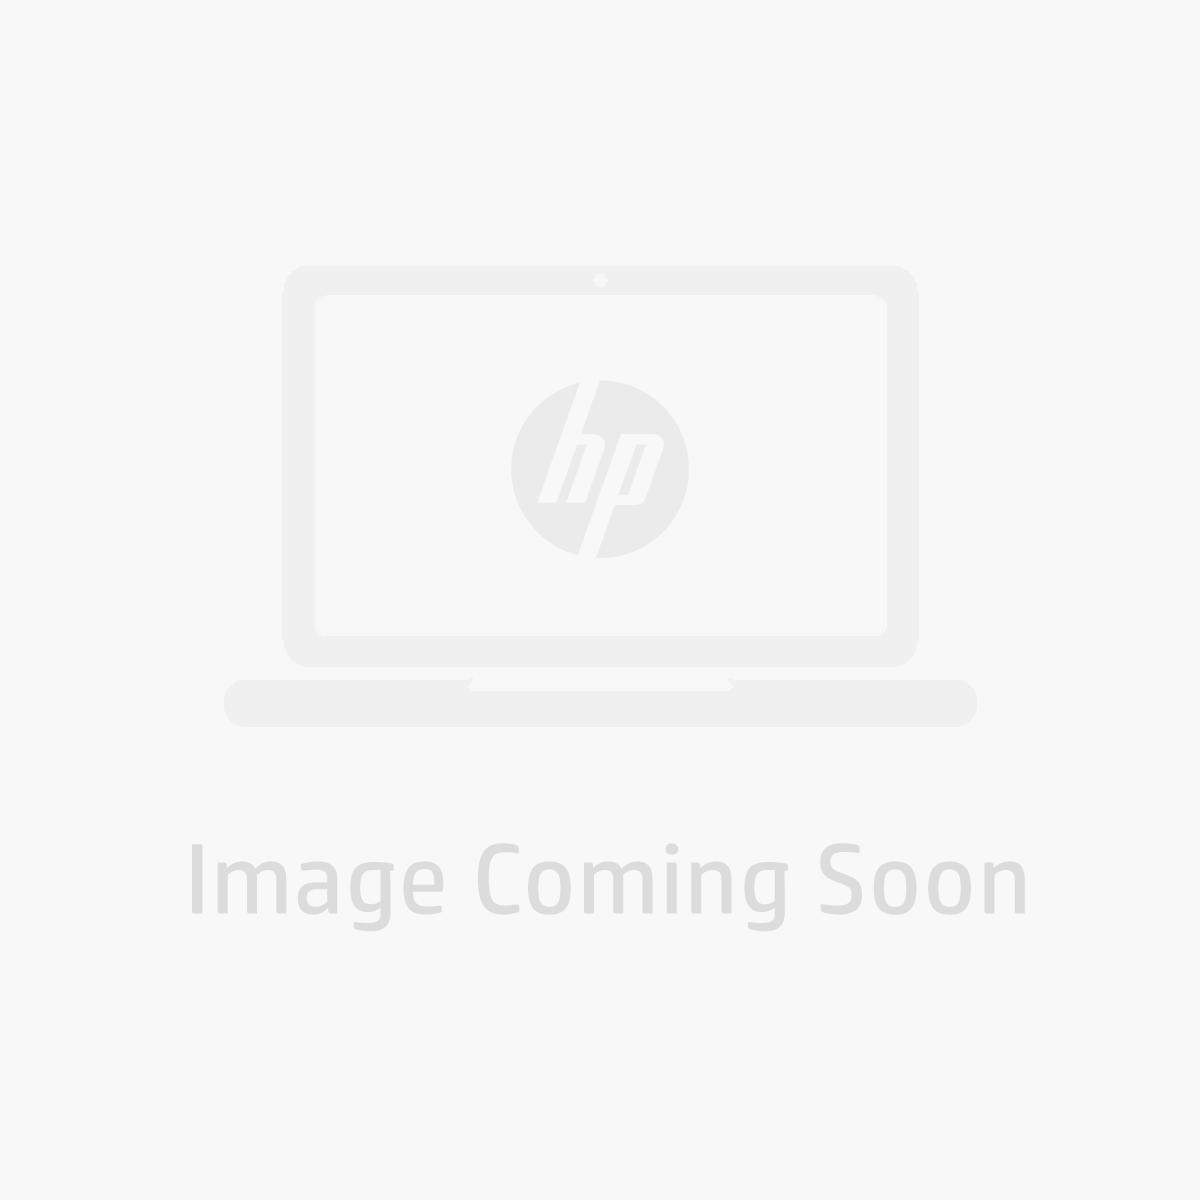 HP Executive Capacitive Stylus